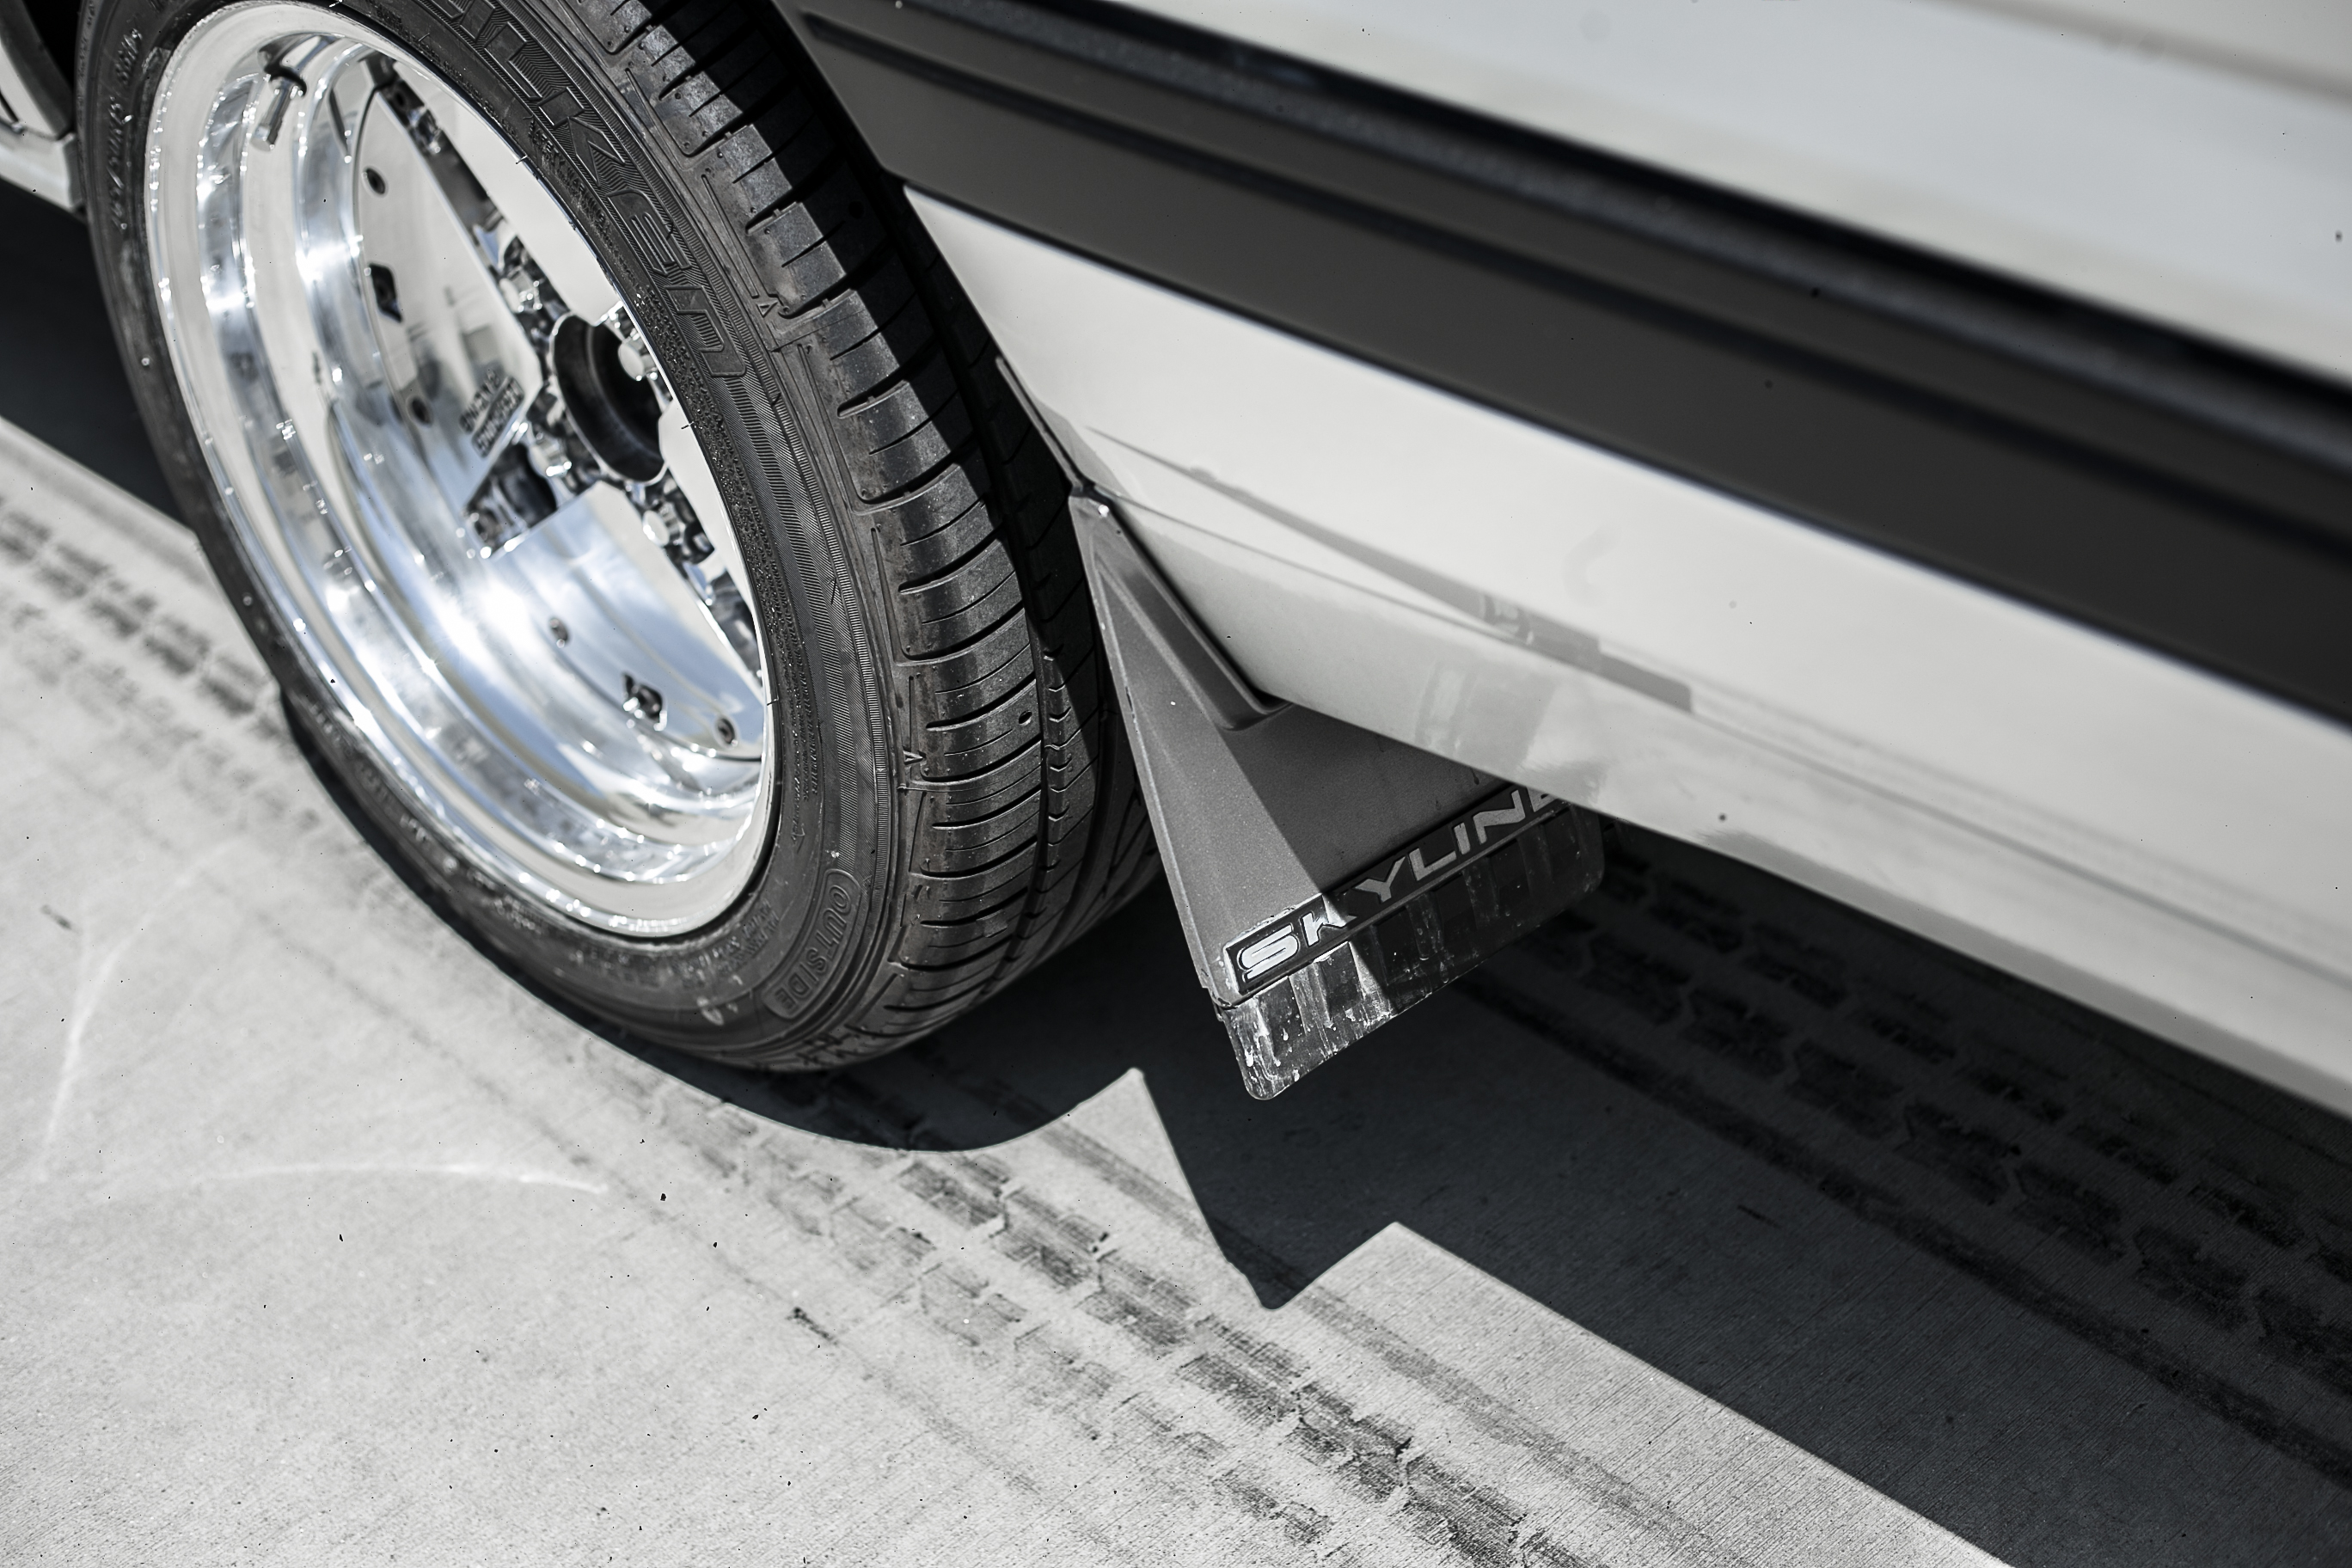 Nissan R31 Skyline turbo wagon wheel detail